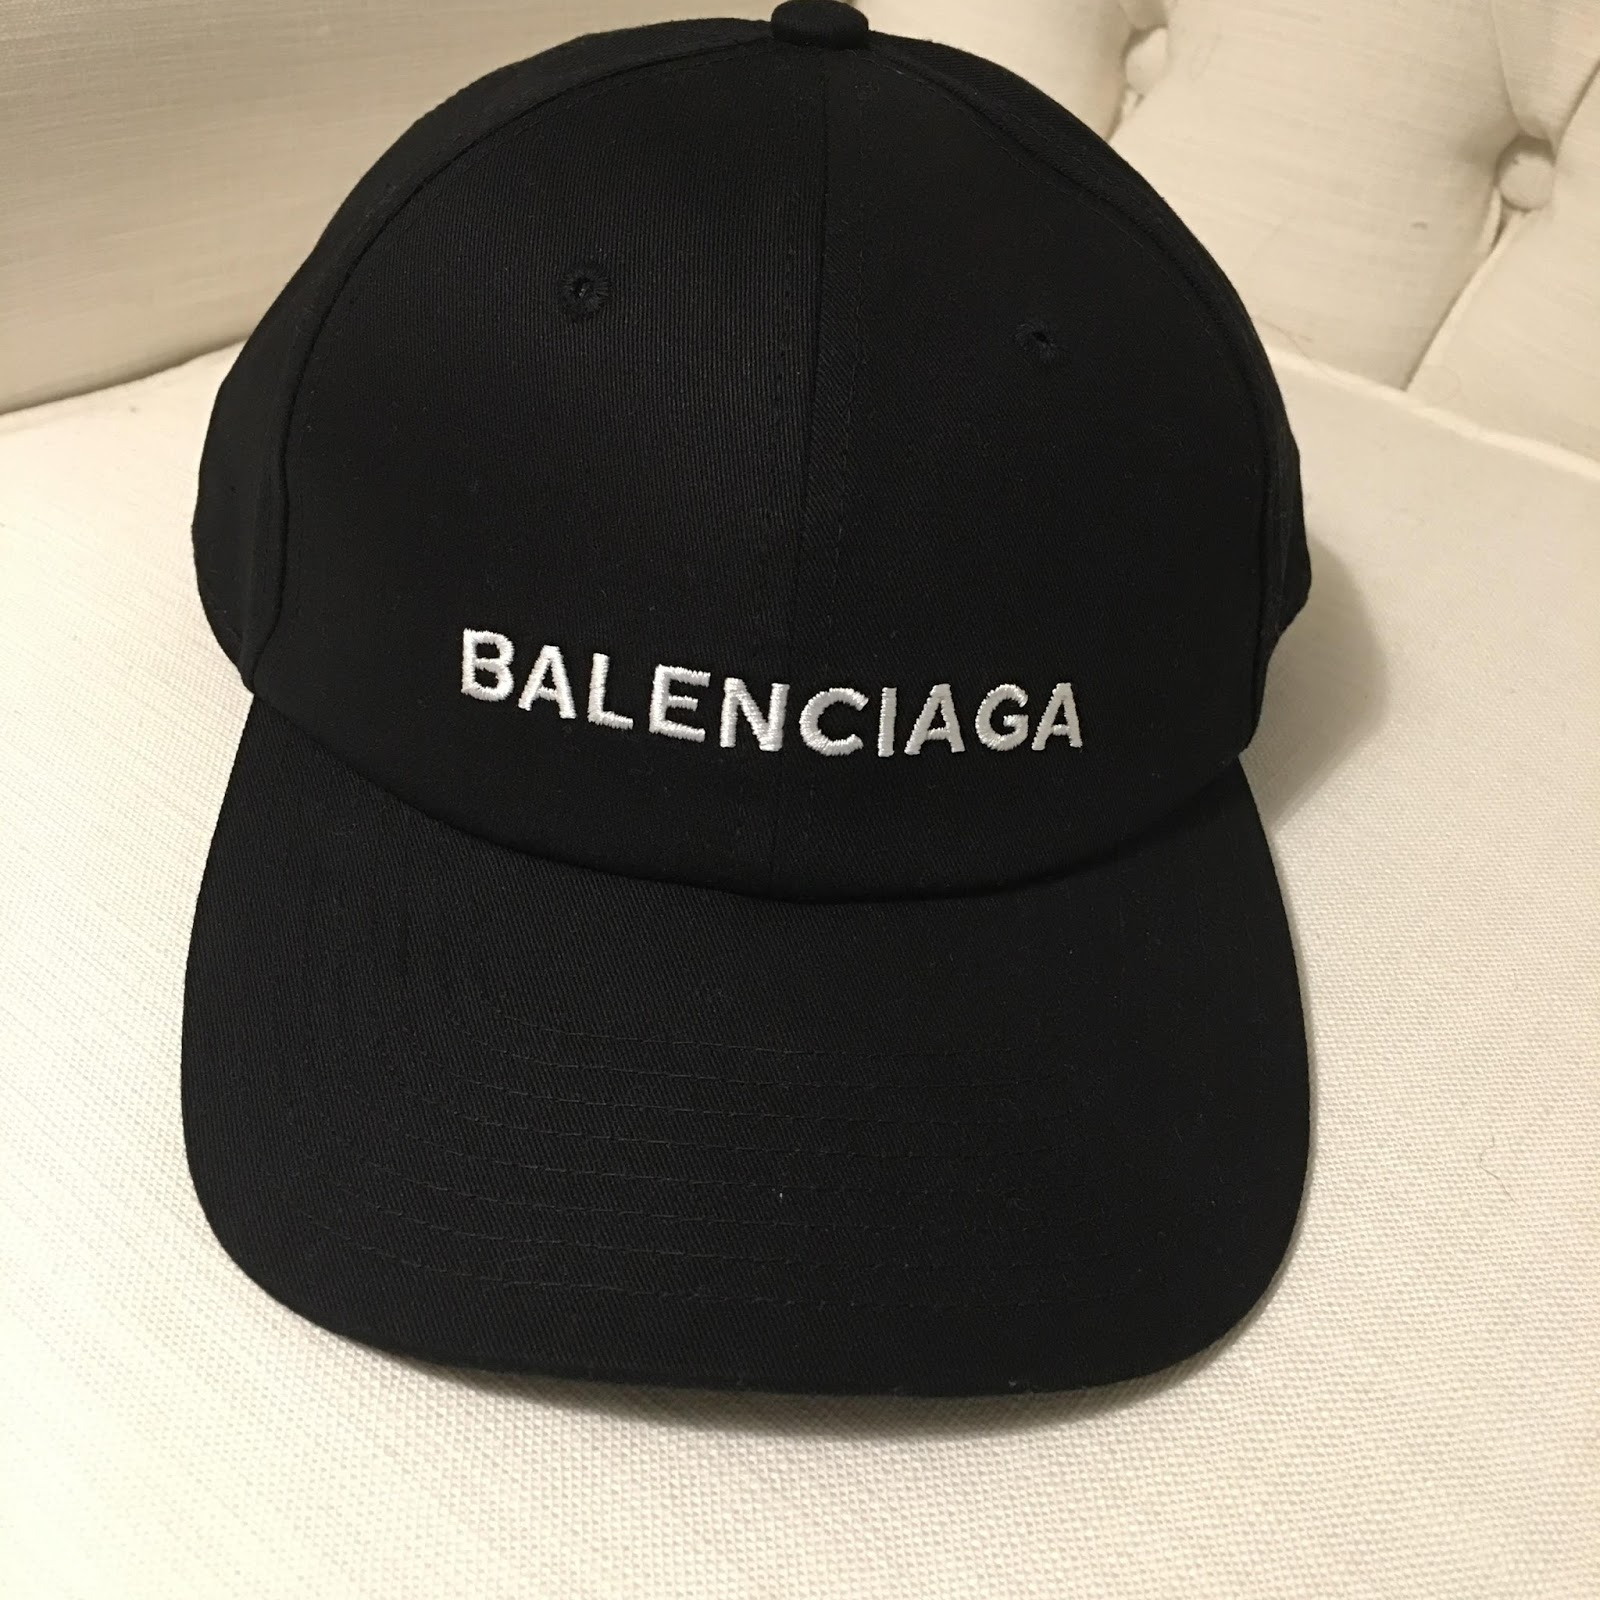 Balenciaga Logo Baseball Cap SS17 Black (Reondistrict) 37d41effa4d